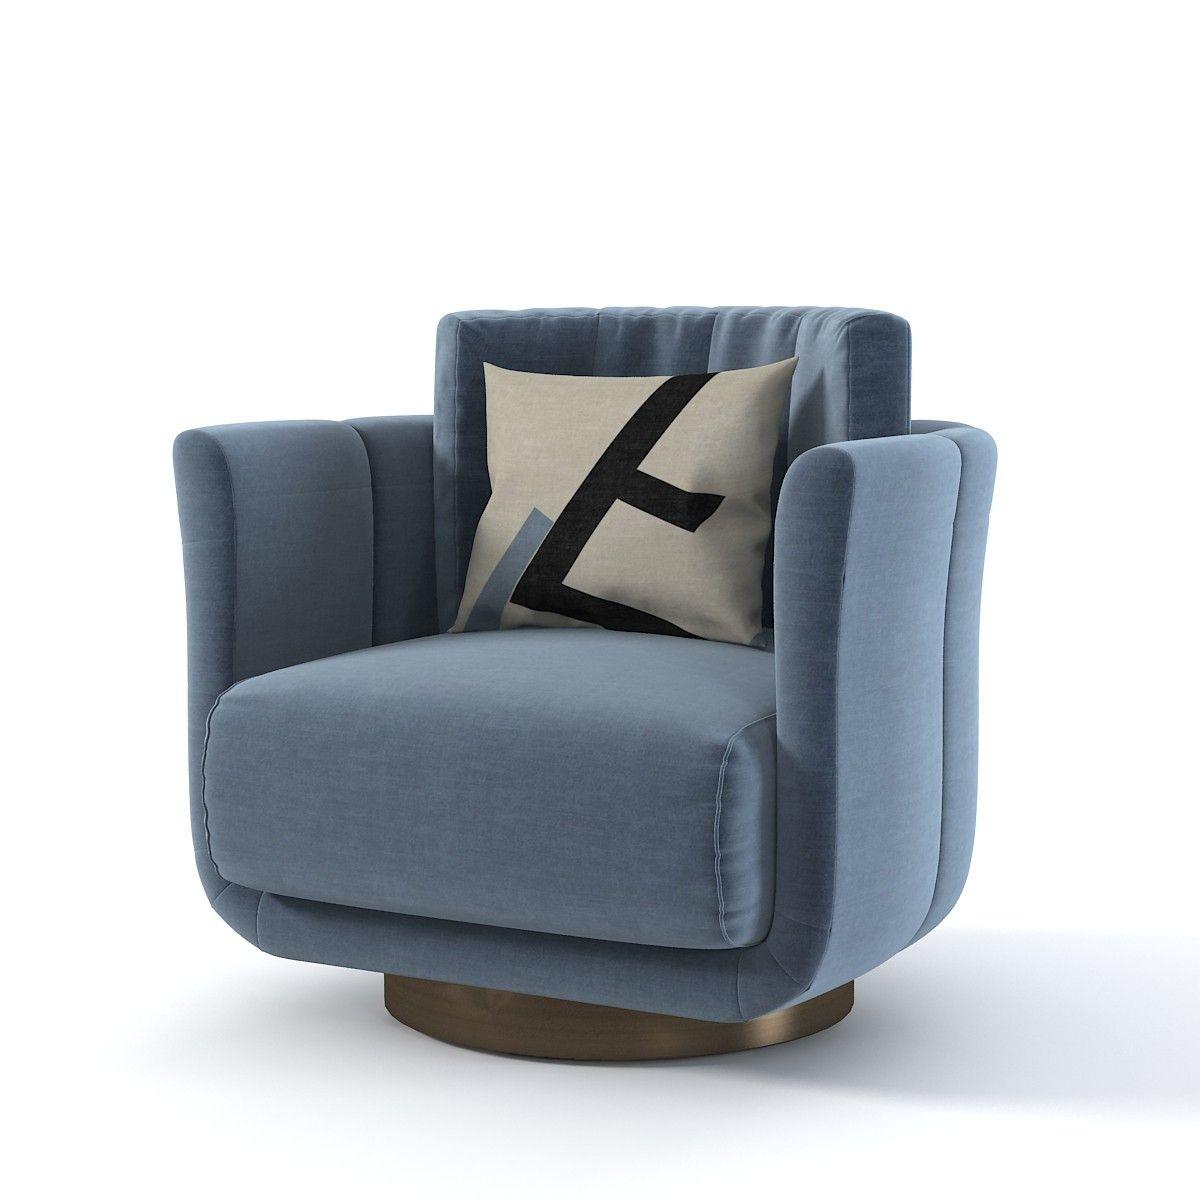 bentley recliner sofa loveseat and armchair set design your own online fendi casa artu 3d model furniture